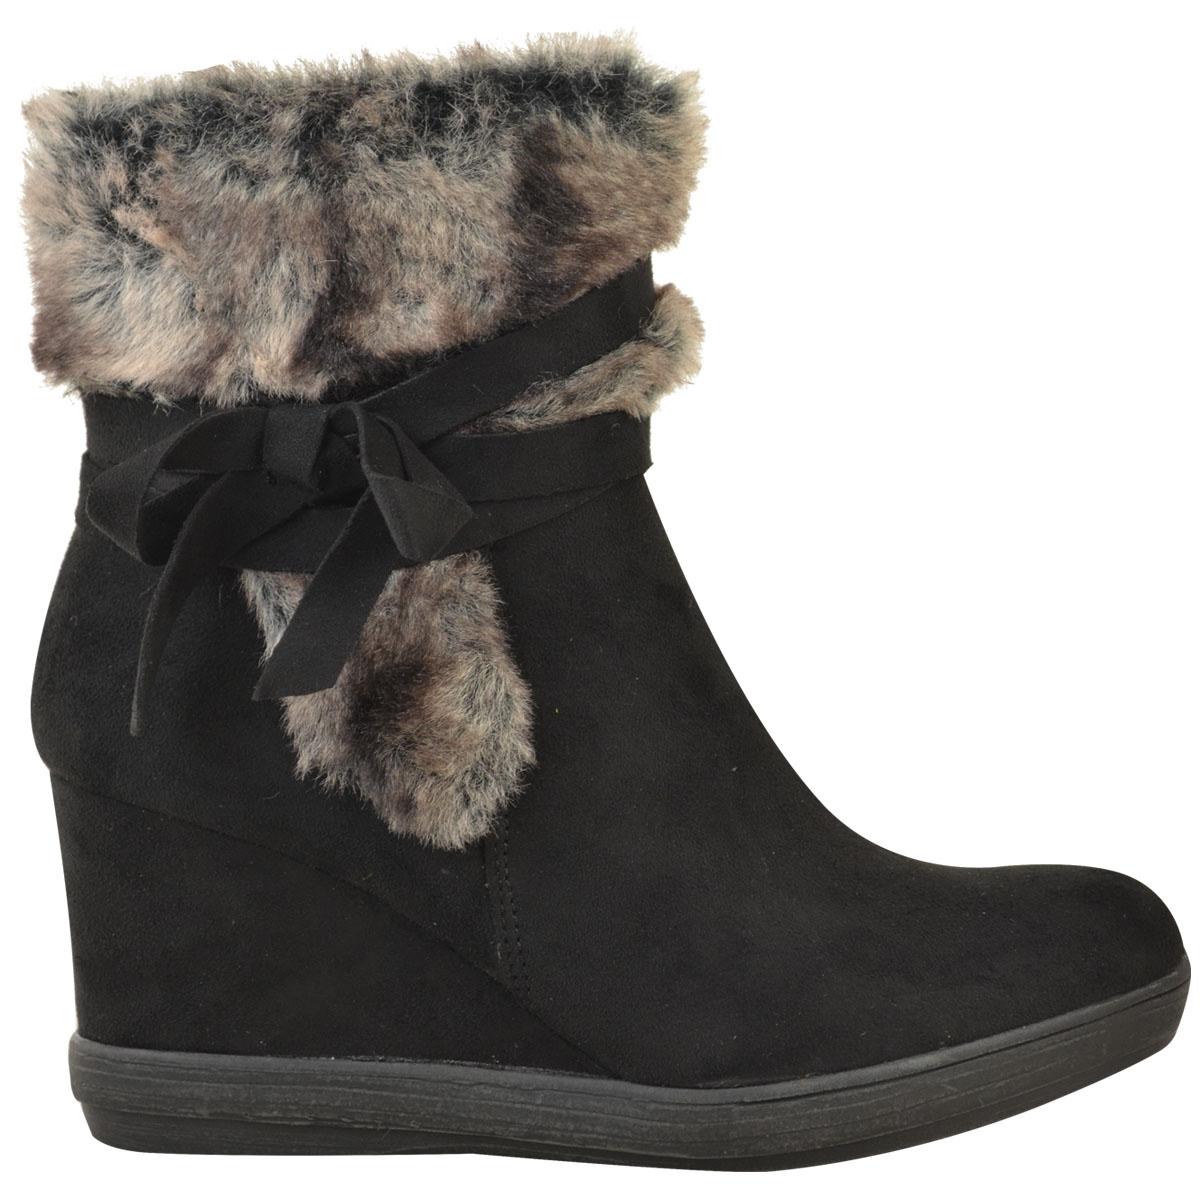 Womens-Ladies-Wedge-Low-Heel-Winter-Knee-Boots-Warm-Faux-Fur-Fleece-Size-UK thumbnail 21